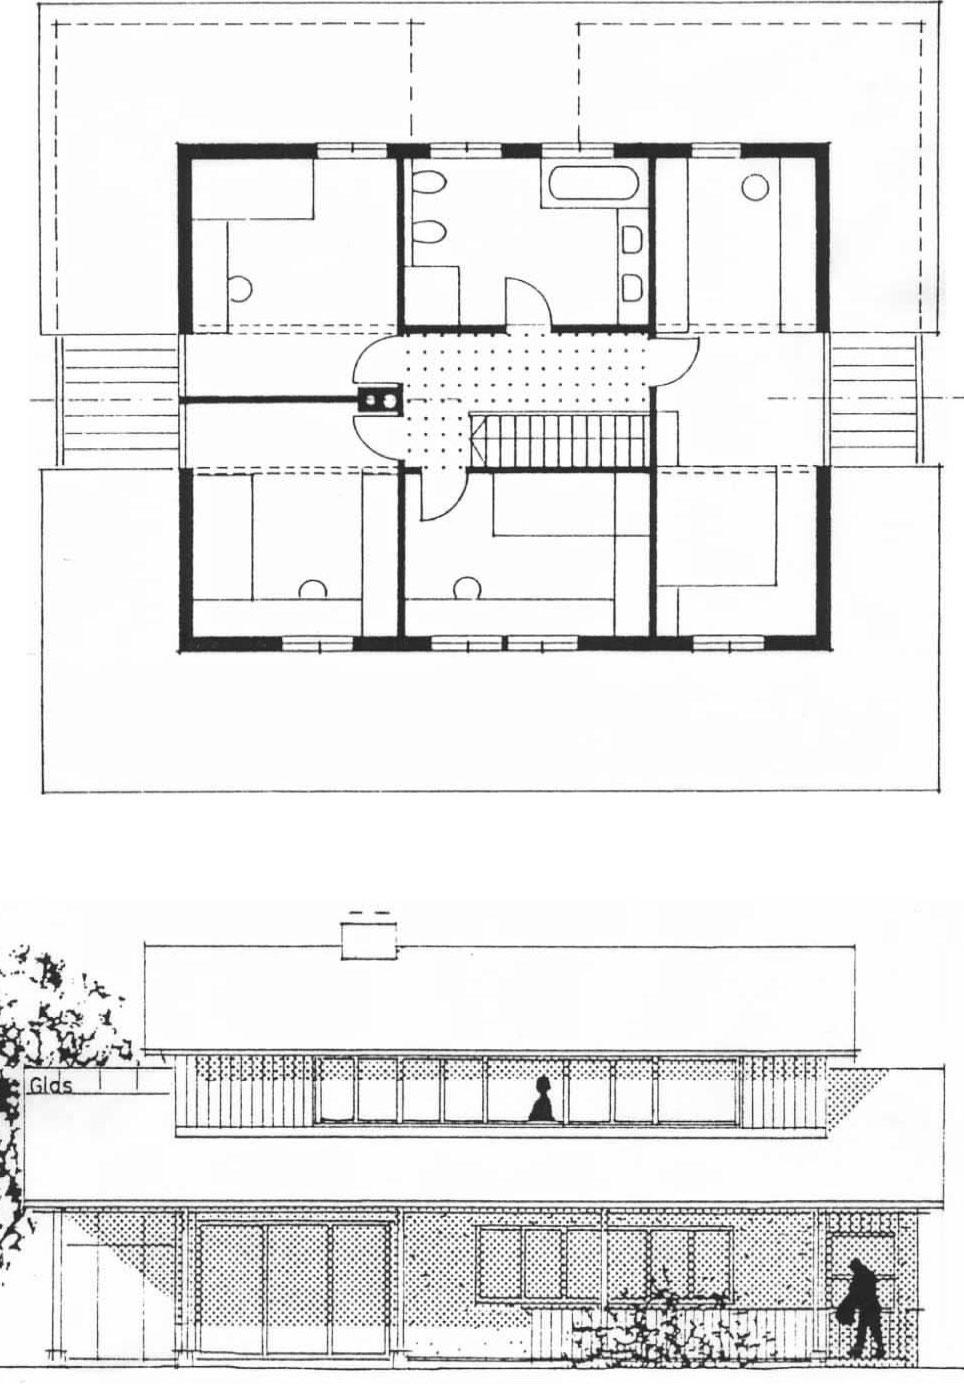 Wohnhaus Leutkirch Skizze 2